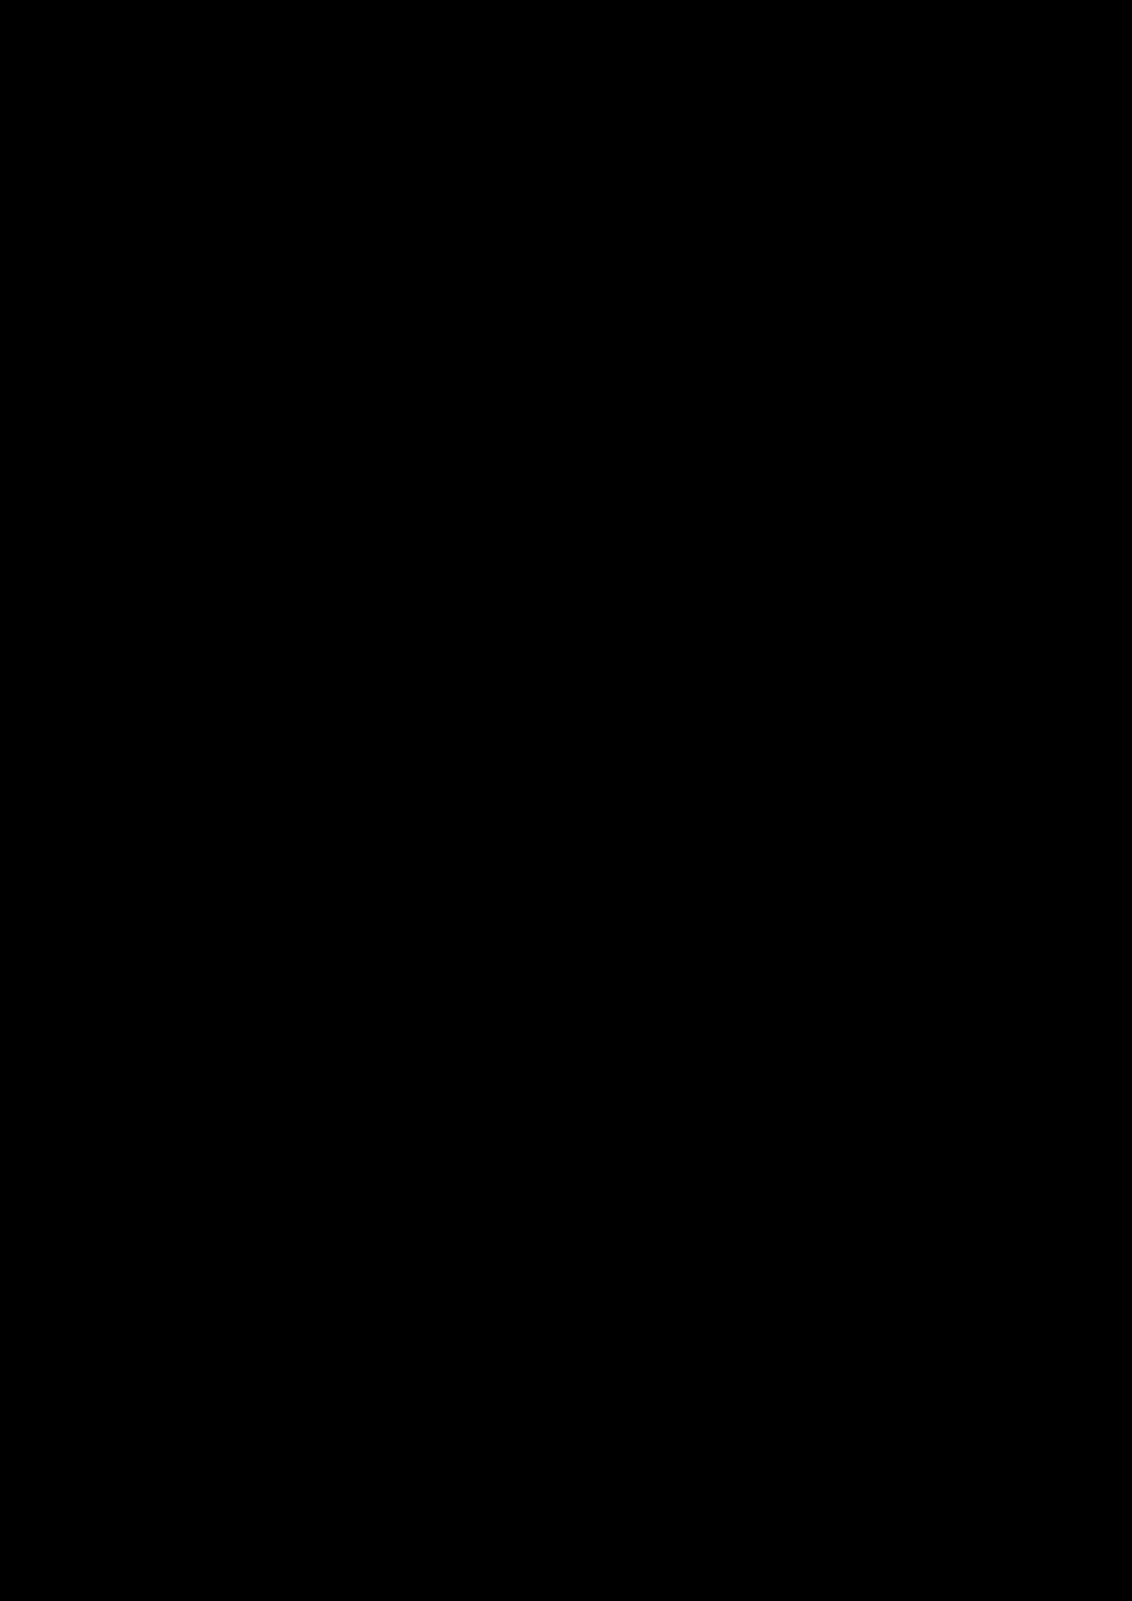 Okean Pustotyi slide, Image 36